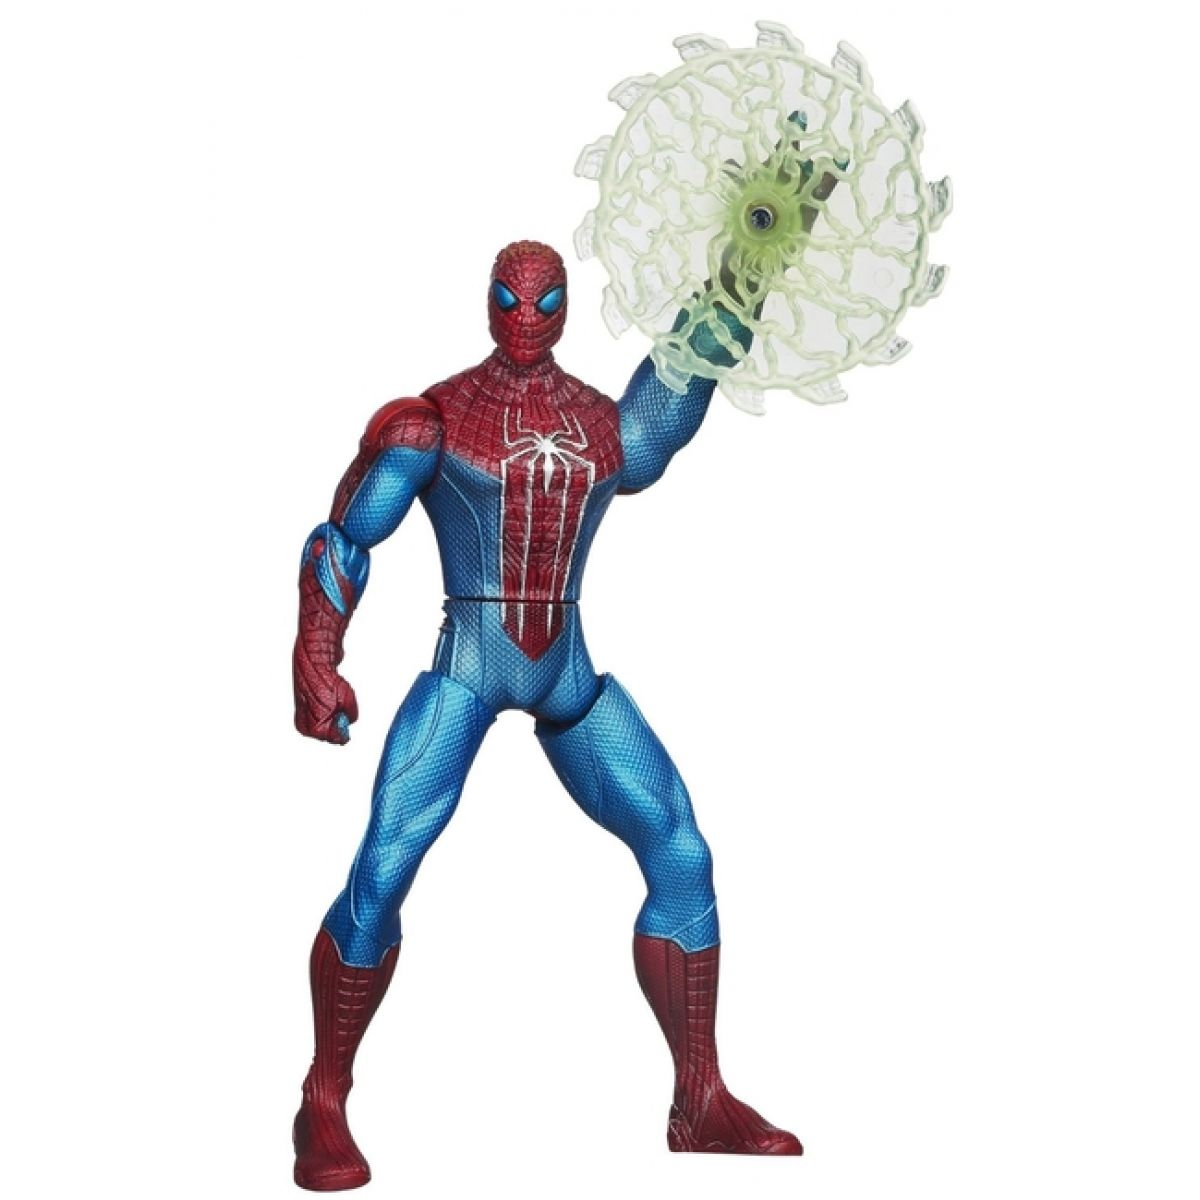 Spiderman kolekce figurek s doplňky Hasbro 37202 - Spiderman 37264